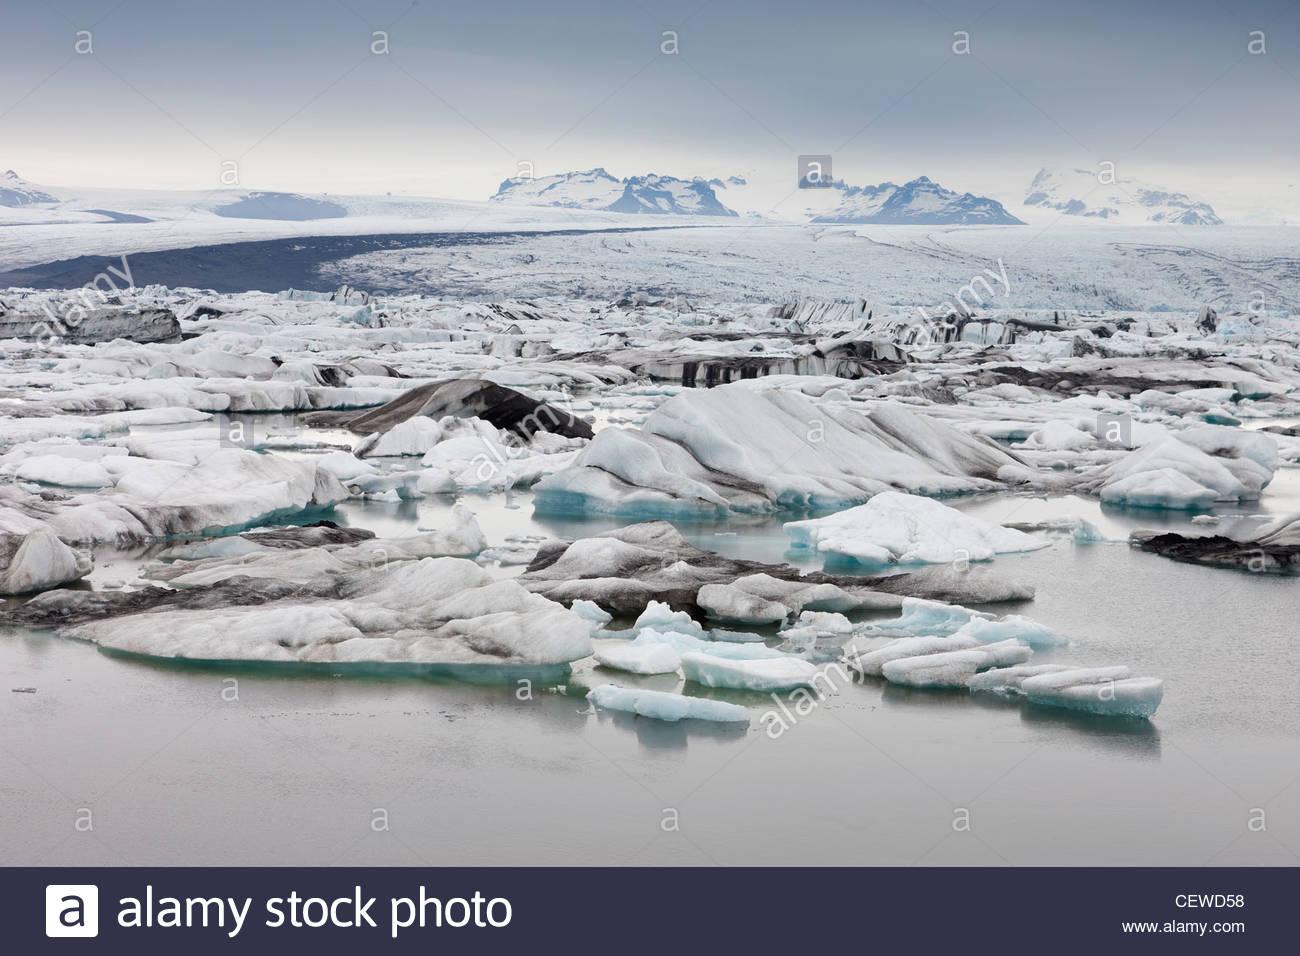 Numerous icebergs float in Jökulsárlón, the Glacier Lagoon, in southeastern Iceland. - Stock Image